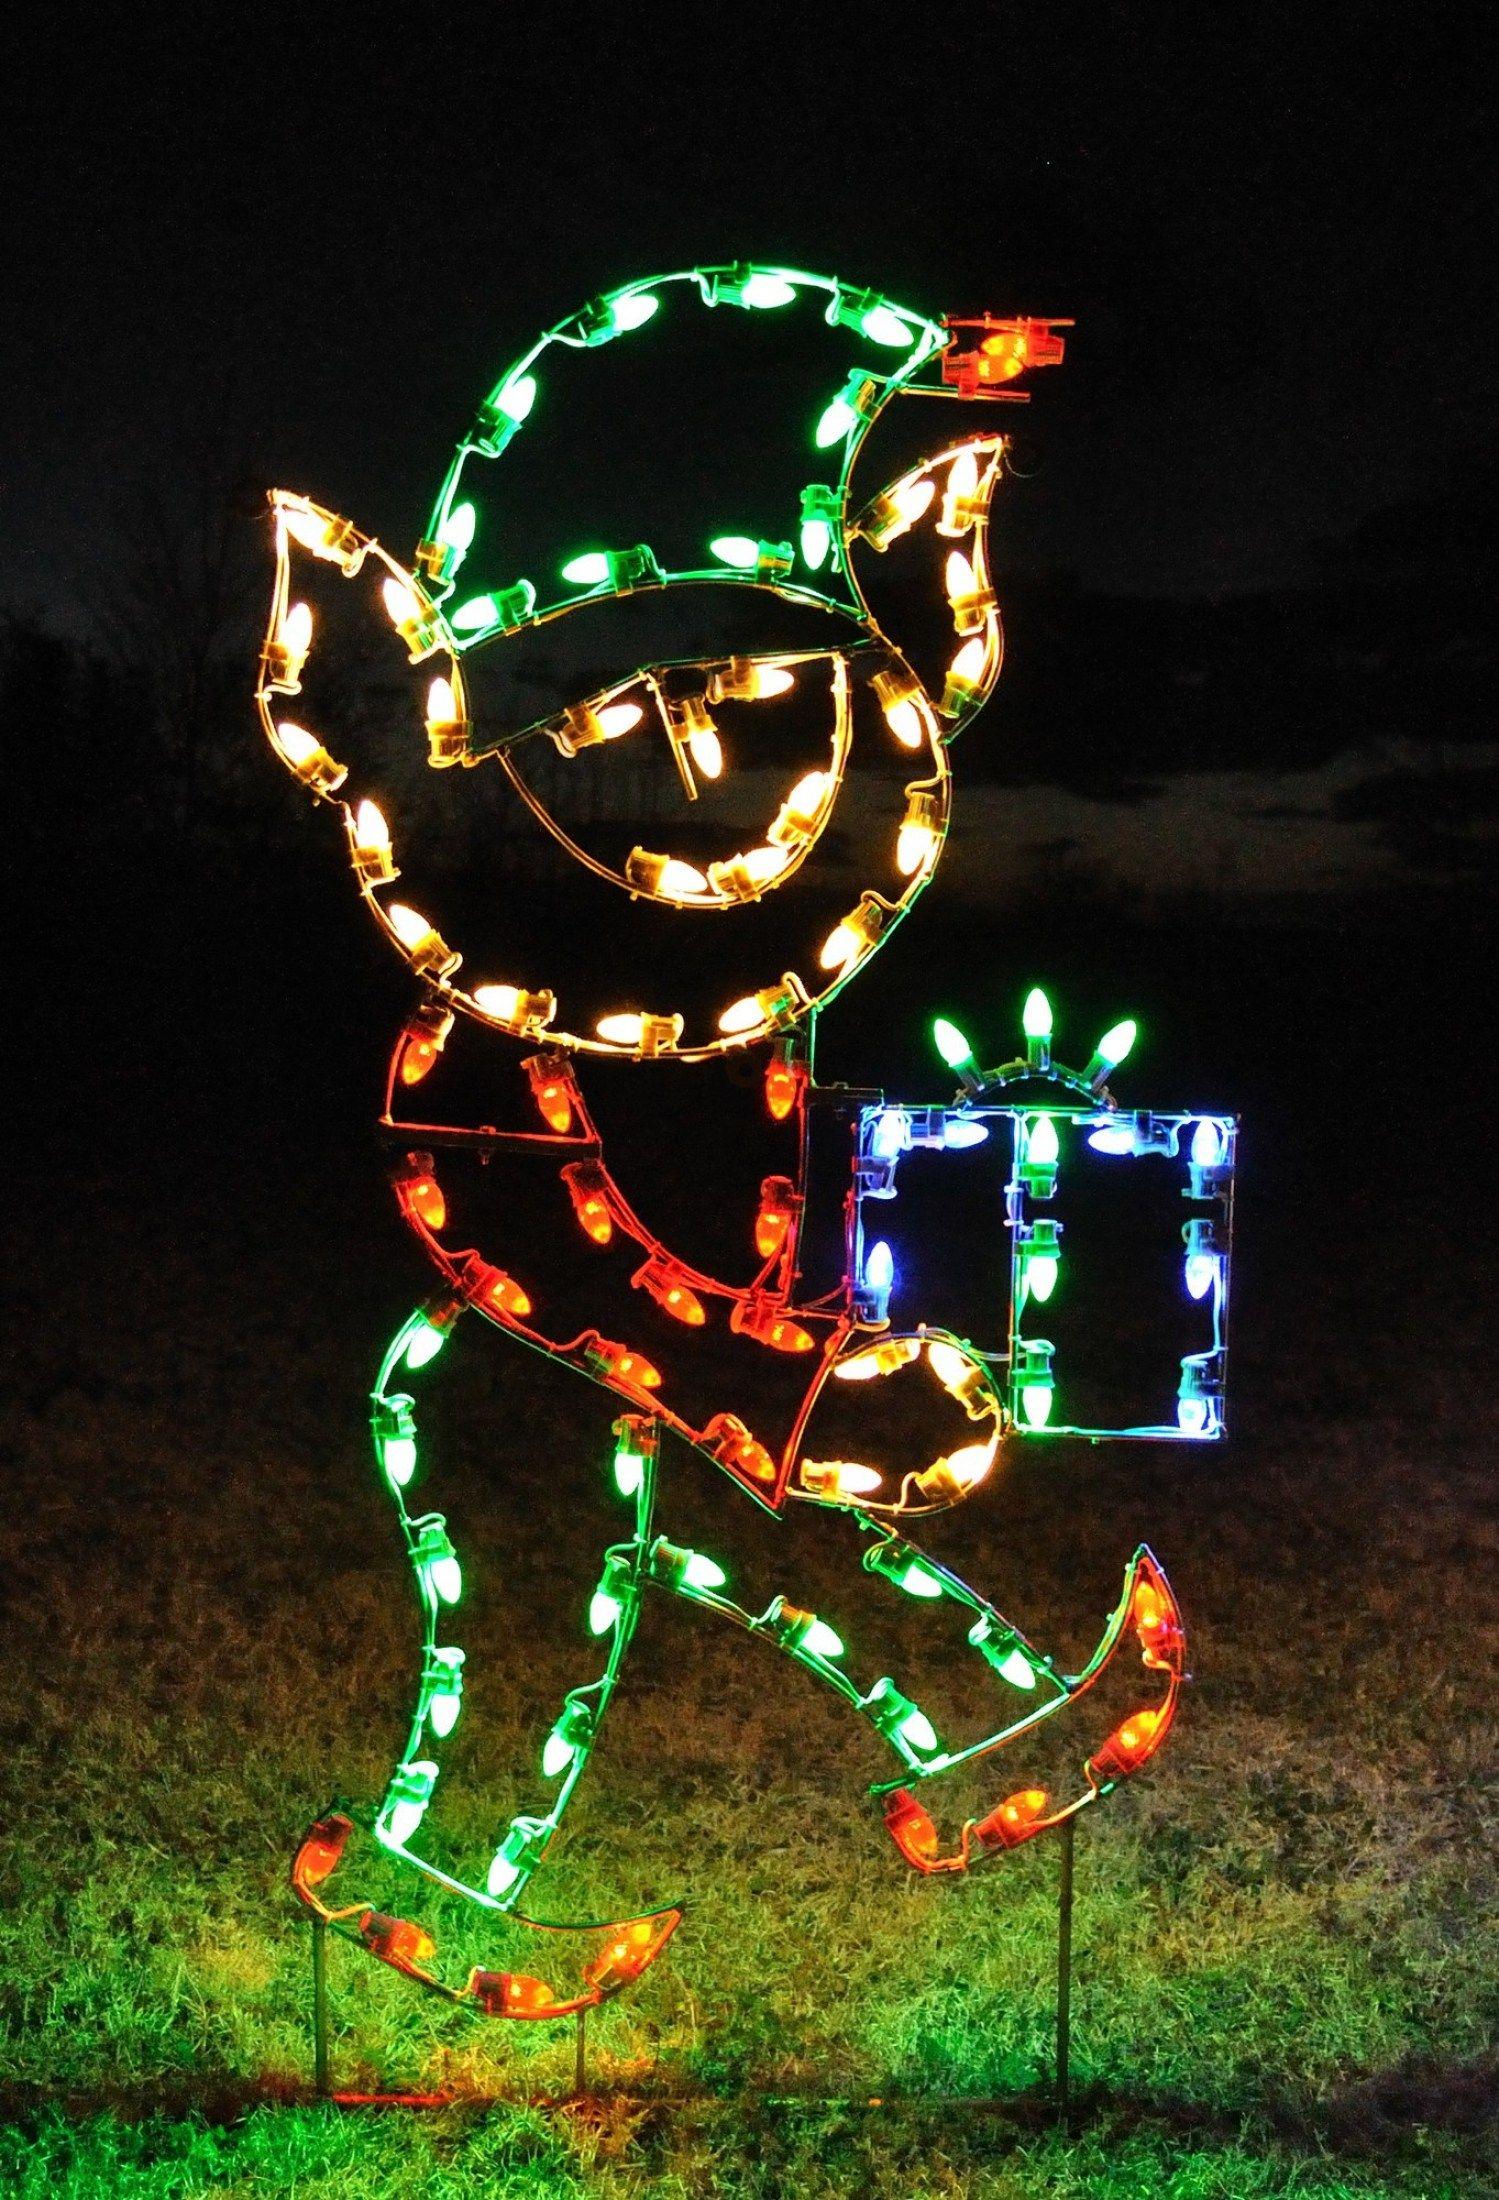 33 stunning outdoor christmas decorations lights - Best Lights For Outdoor Christmas Decorations